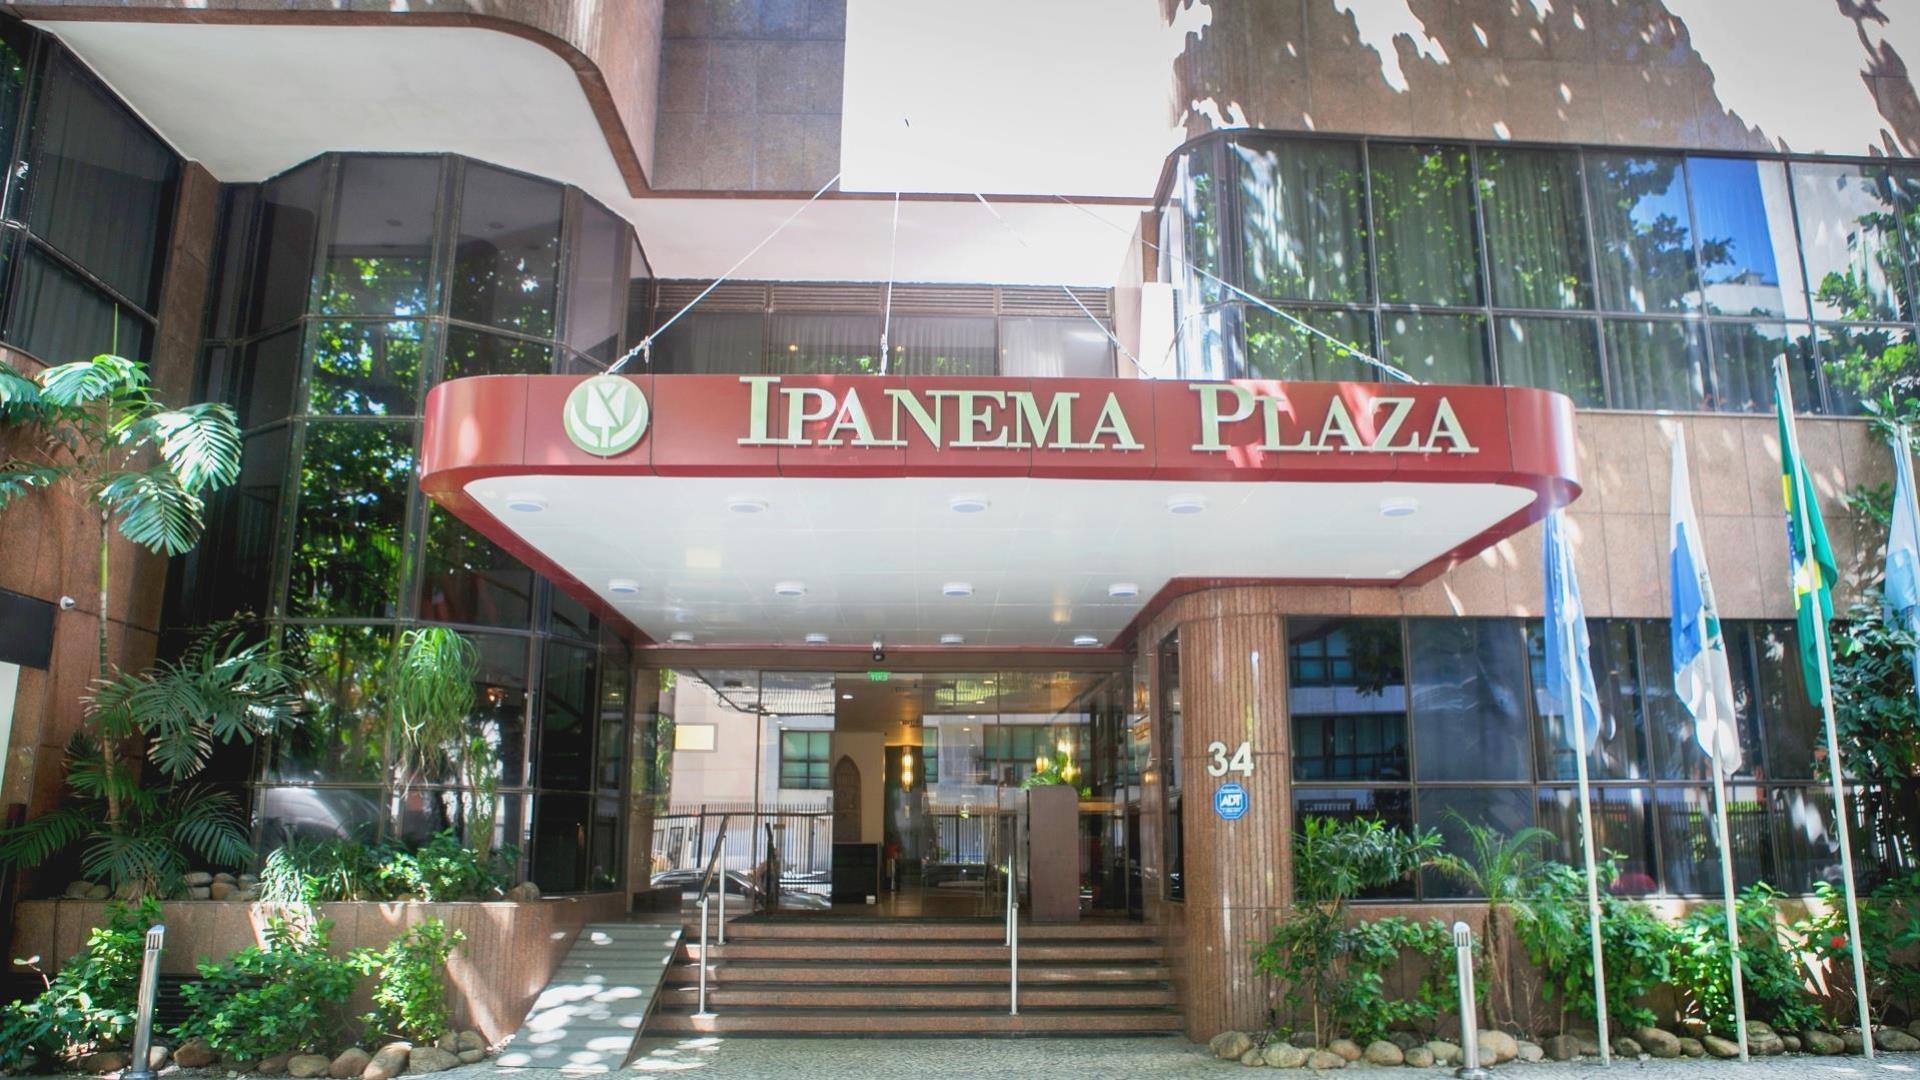 Brasilien Rio de Janeiro: Superior Hotel - Hotel Ipanema Plaza